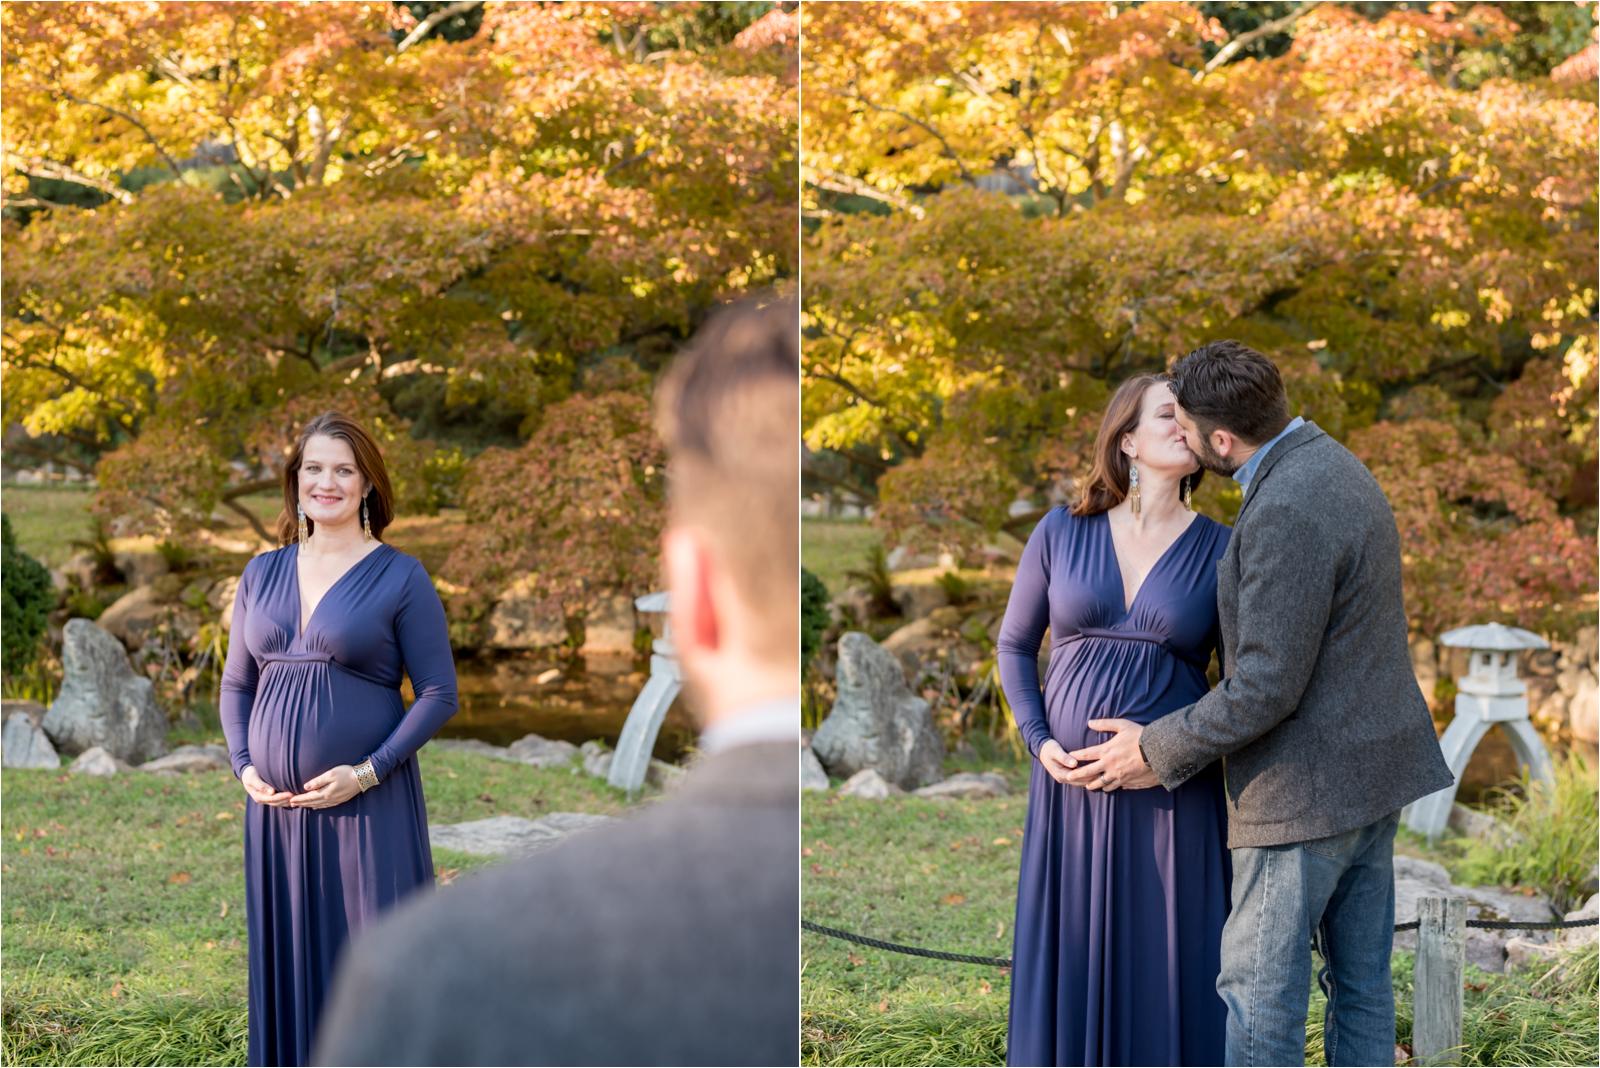 Maternity photography richmond va Family, Newborn, Maternity, and Wedding Photographer